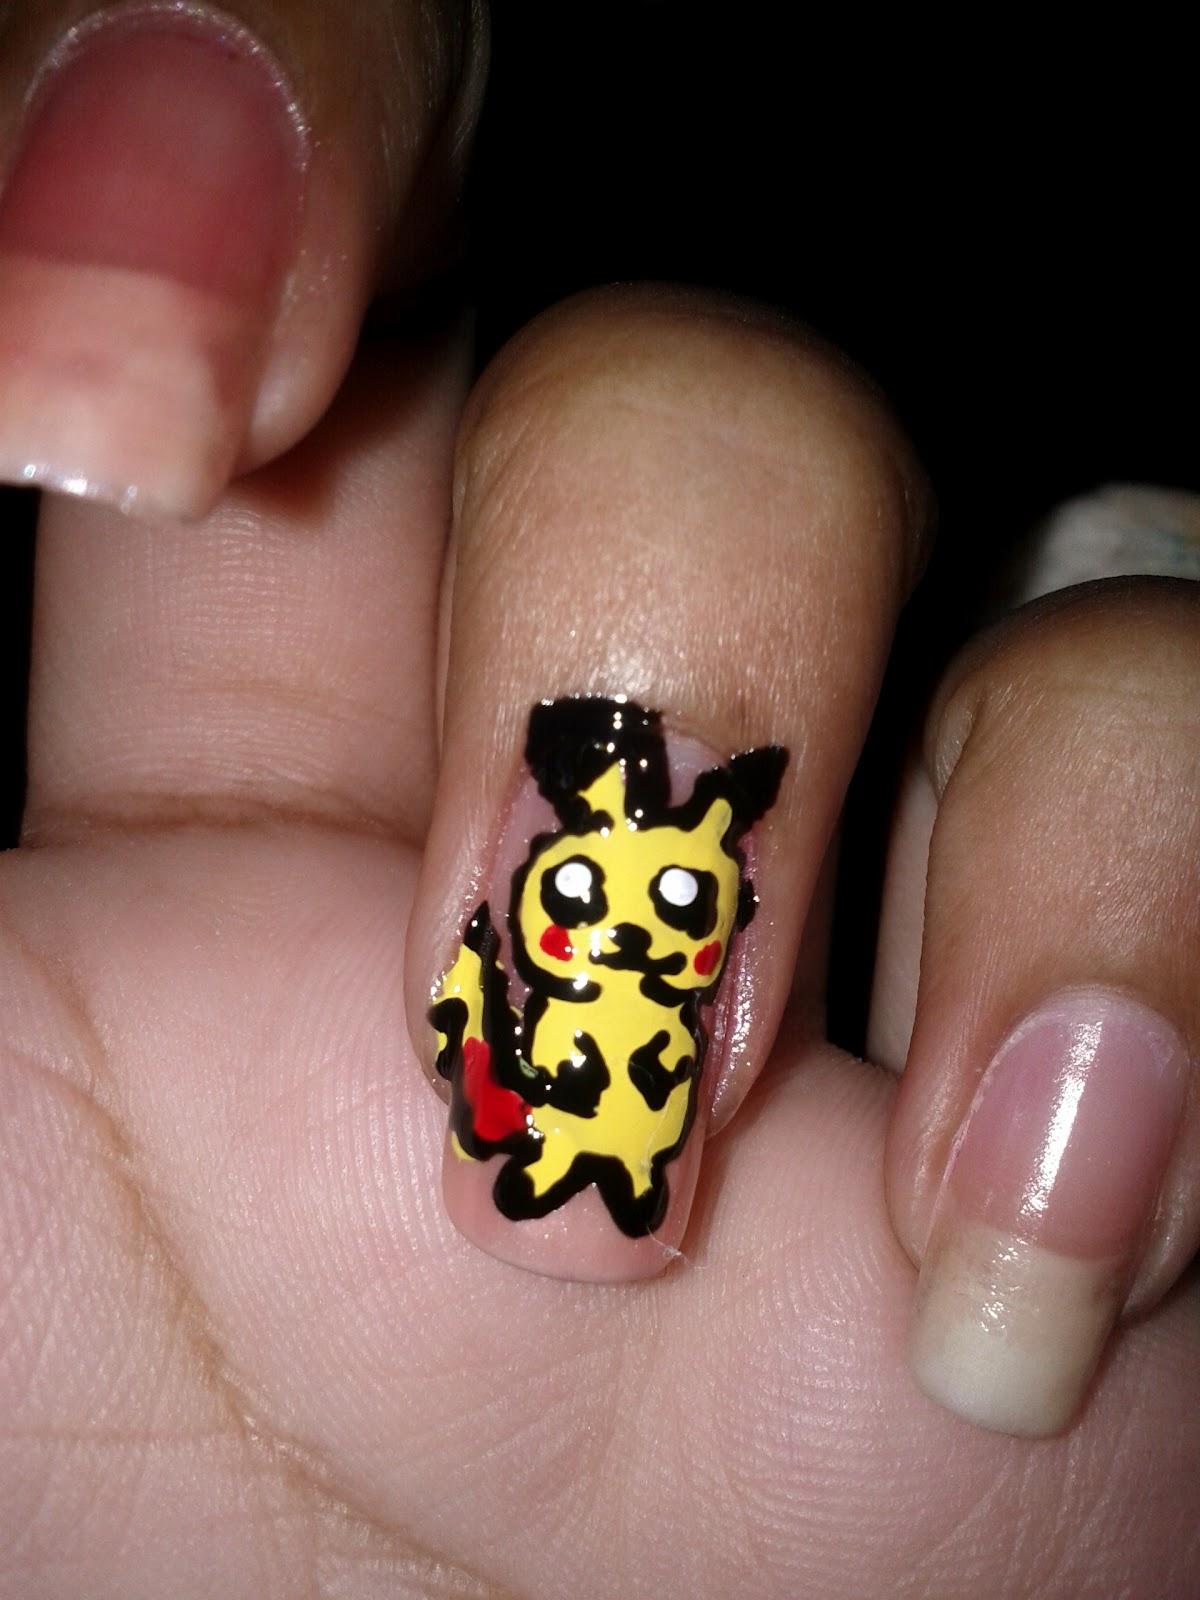 Nail Designs/Art: yellow cartoon animal ( pikachu look alike)